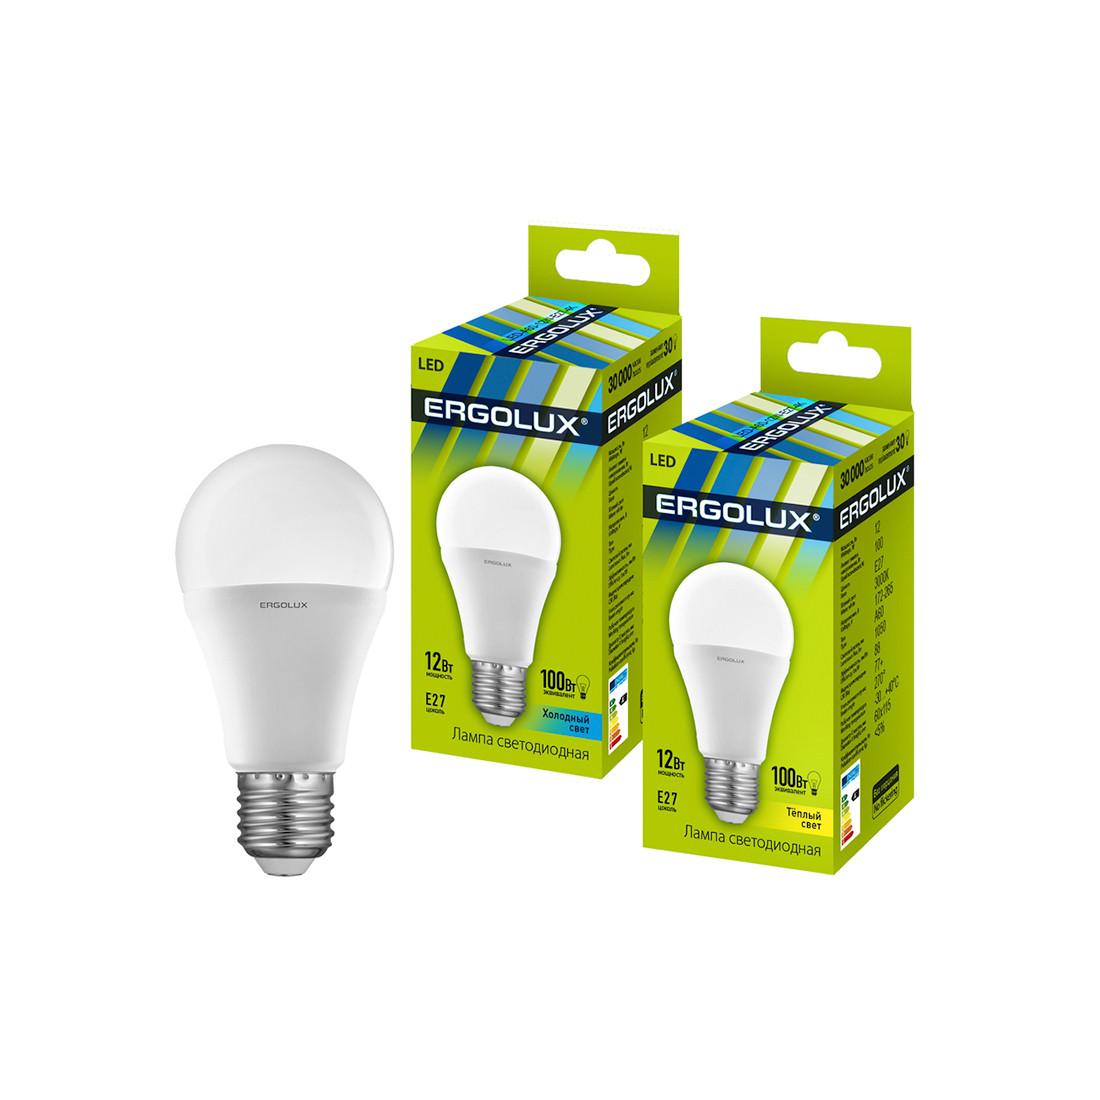 Эл. лампа светодиодная Ergolux LED-A60-12W-E27-4K